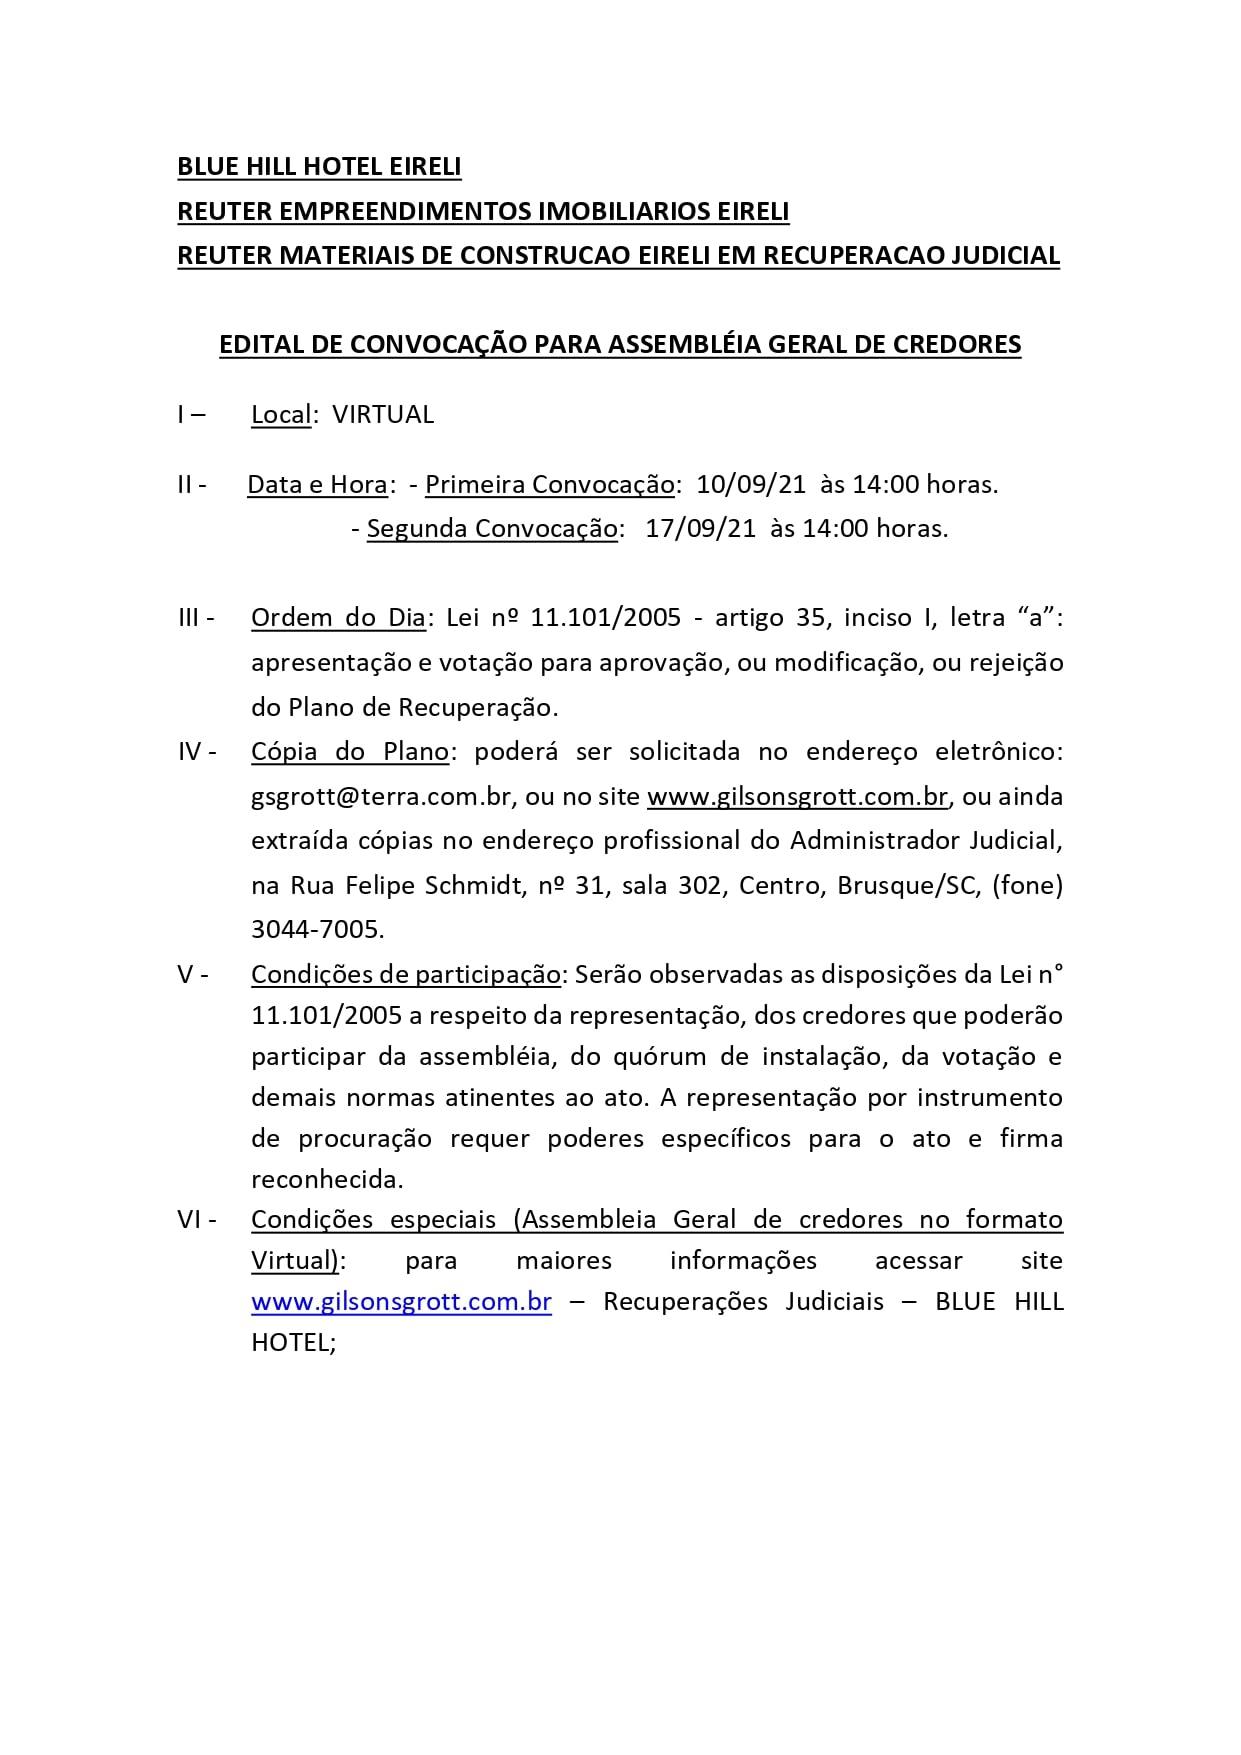 Edital AGC - Jornal blue hill-page-0001 (1)